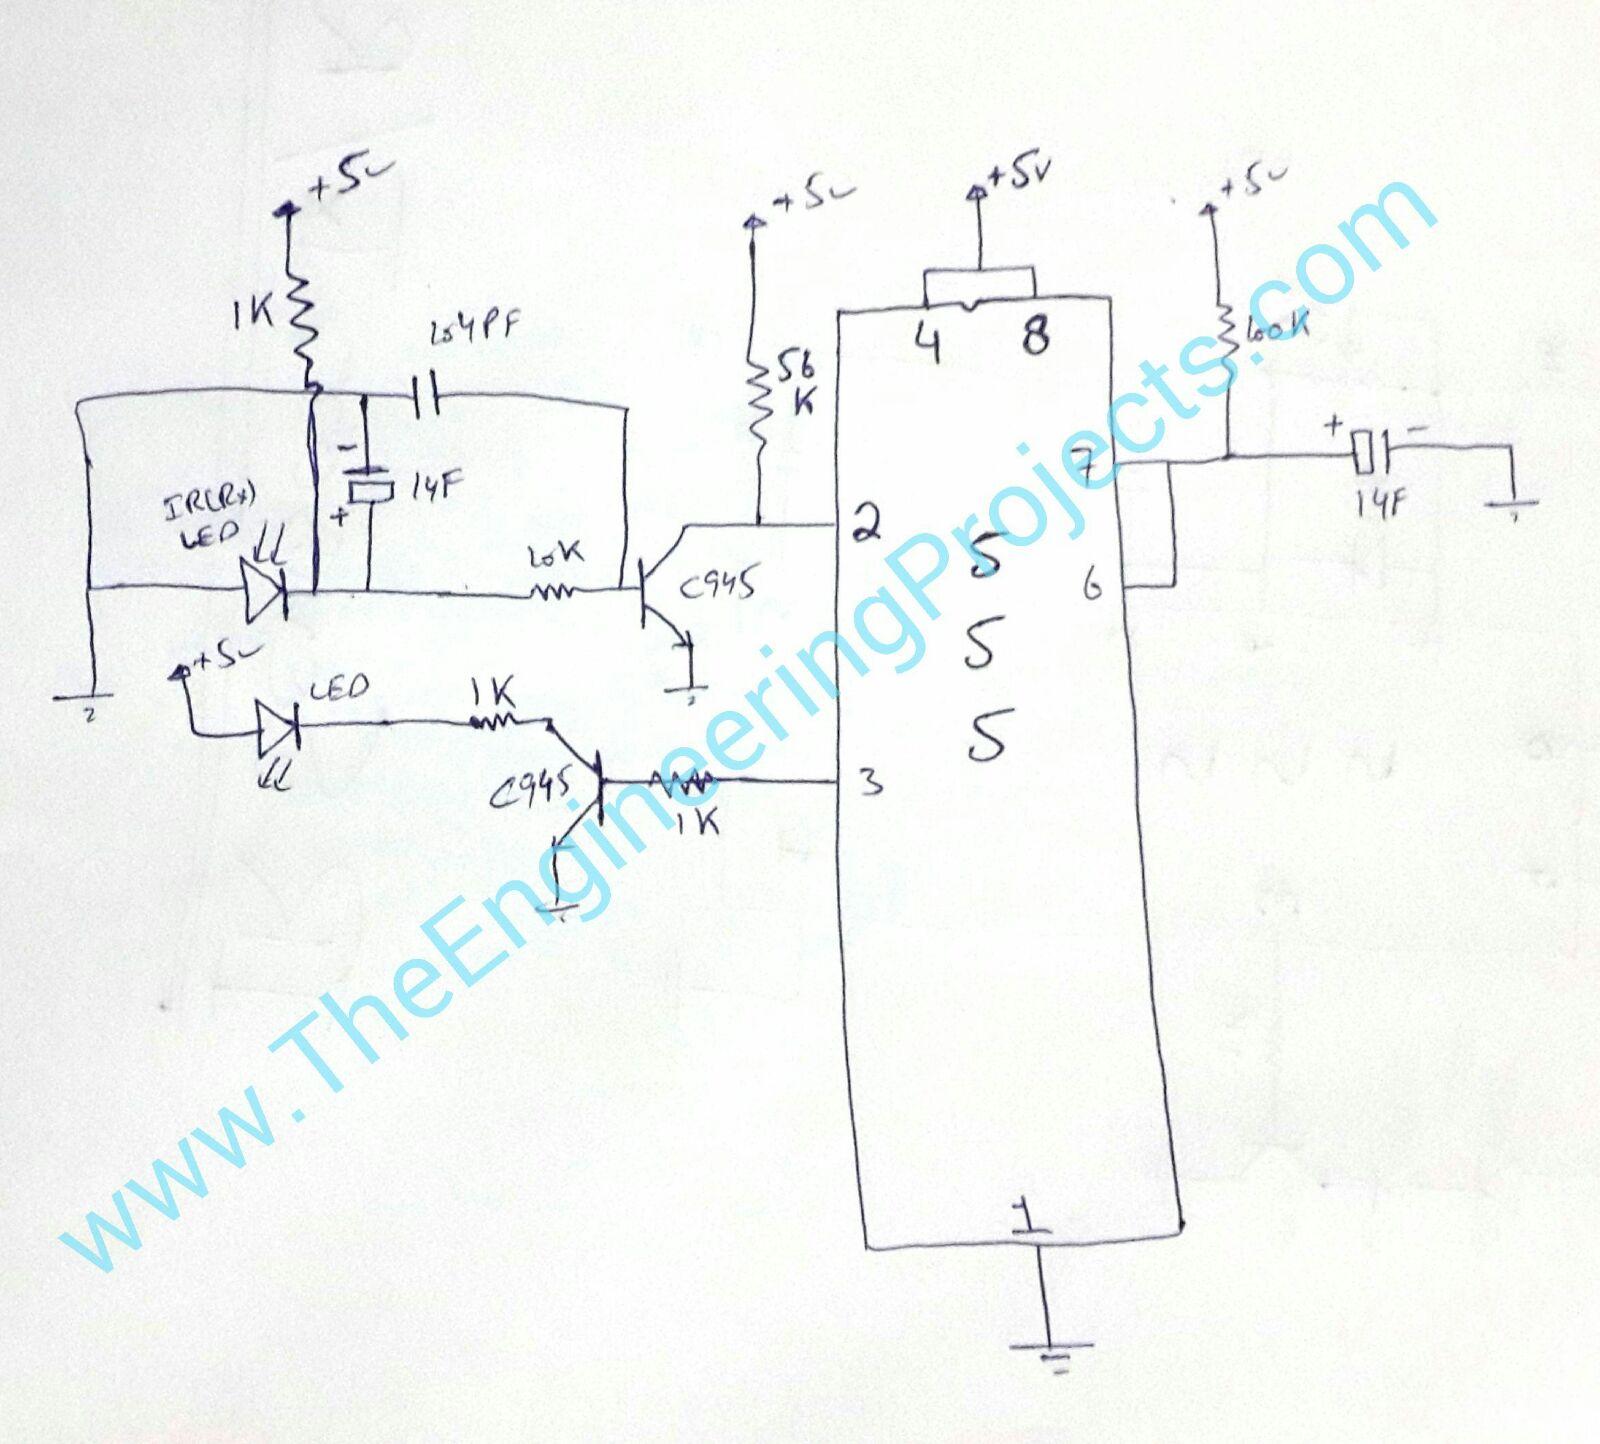 Infrared Proximity Sensor Wiring Diagram